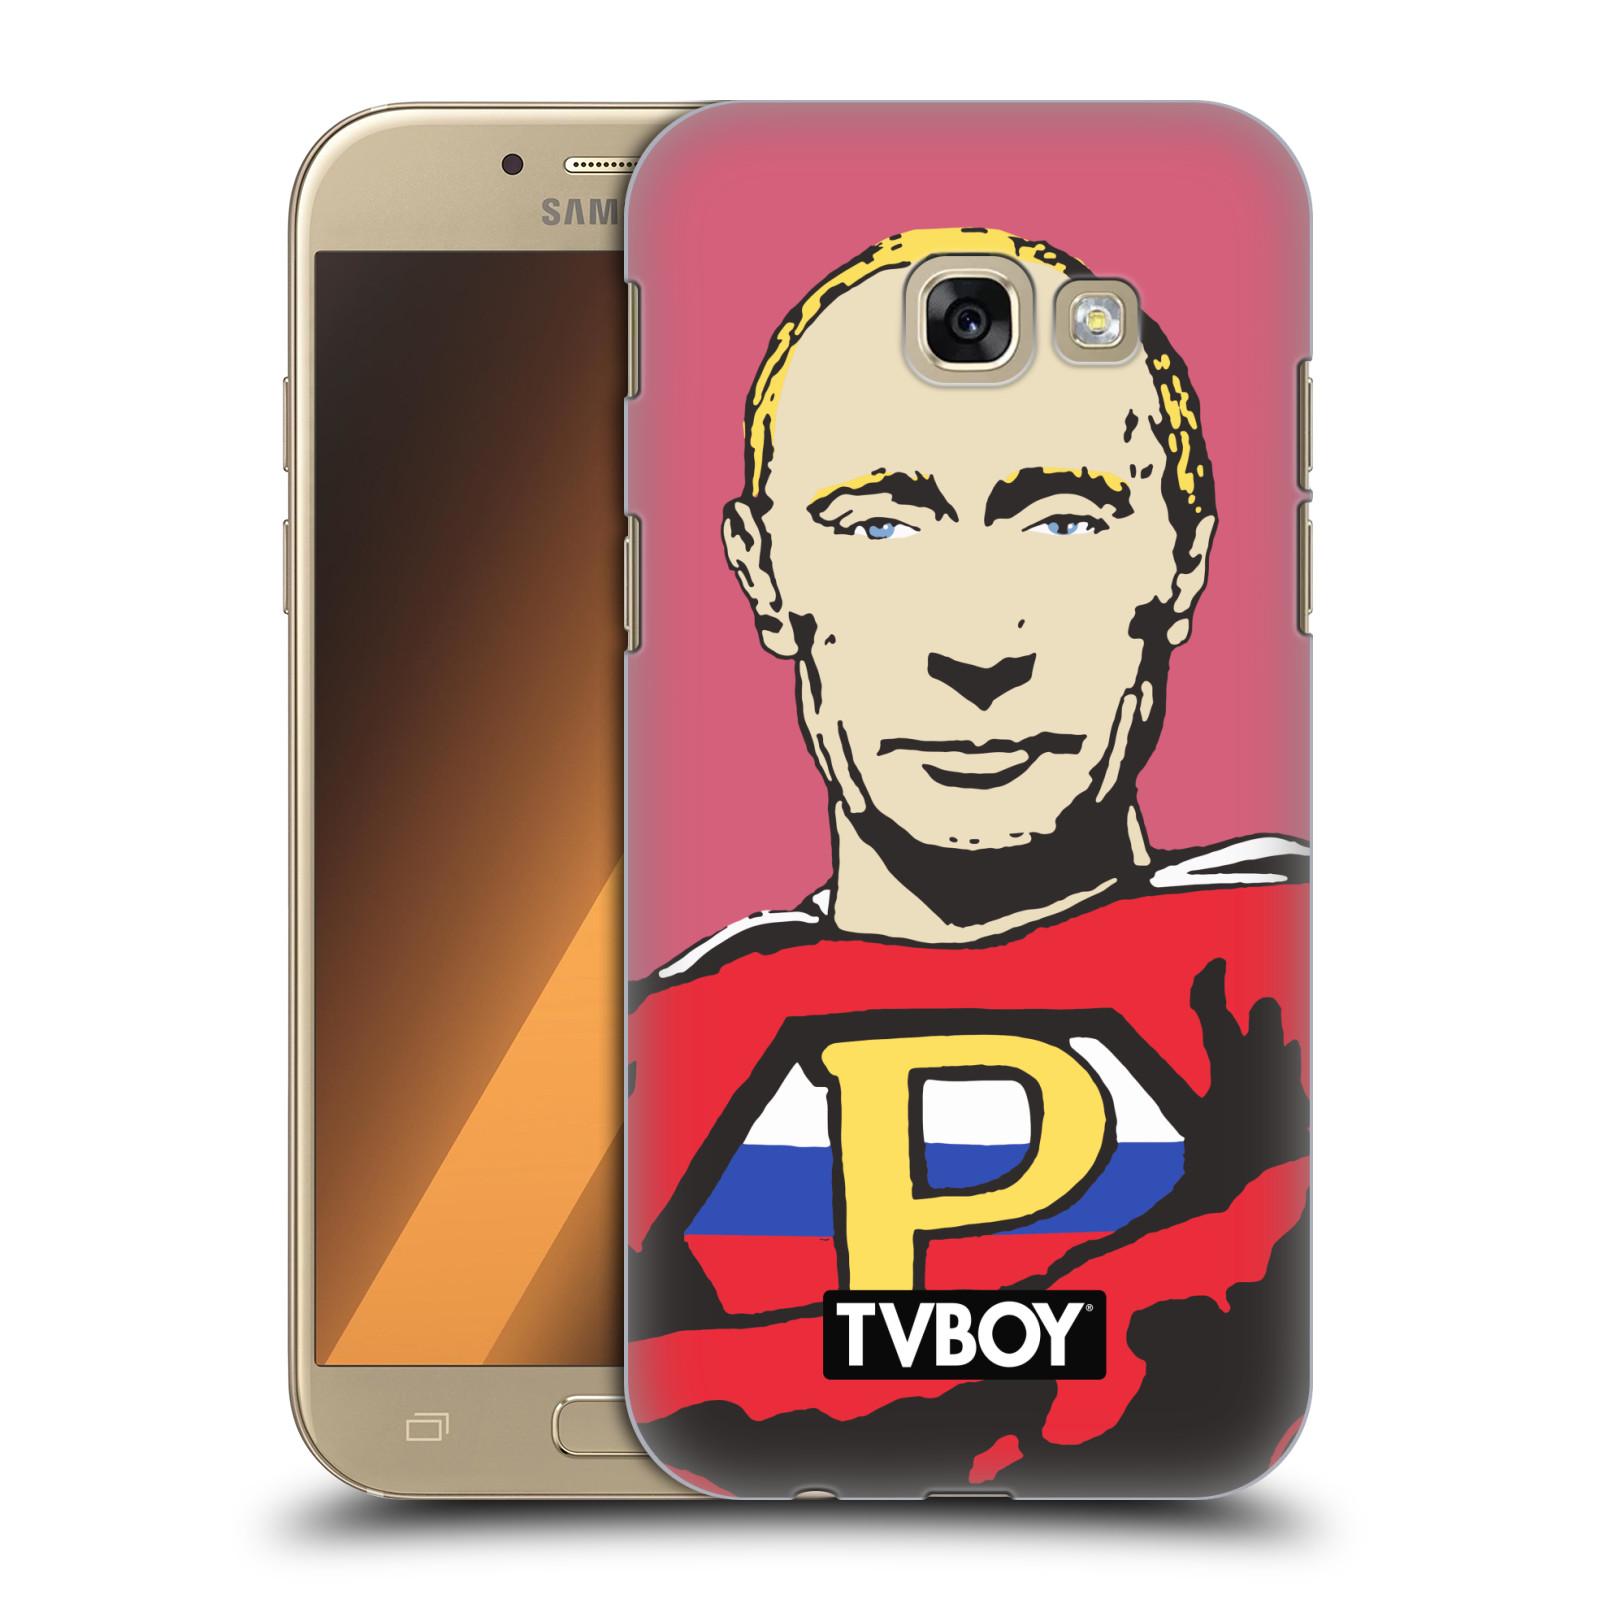 Plastové pouzdro na mobil Samsung Galaxy A5 (2017) HEAD CASE - TVBOY - Super Putin